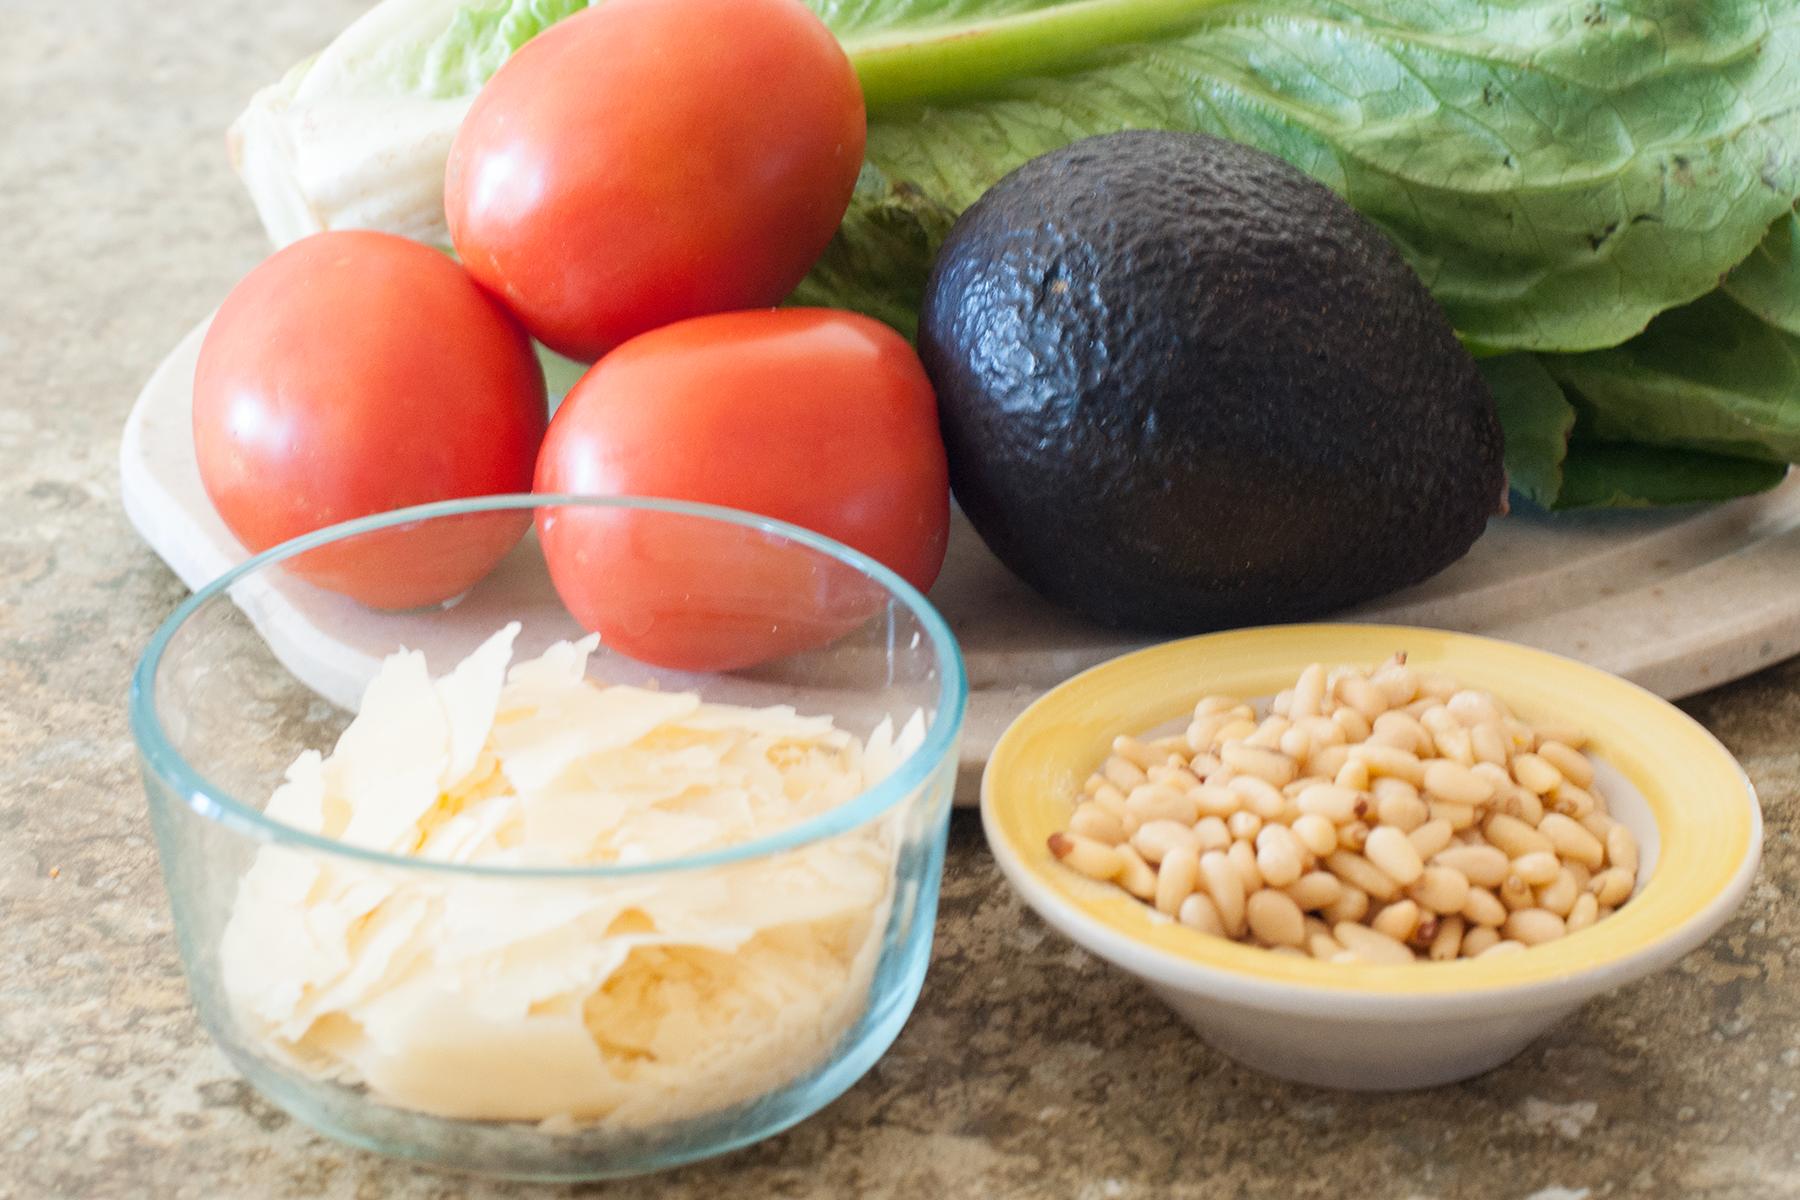 salad ingredients - feature image